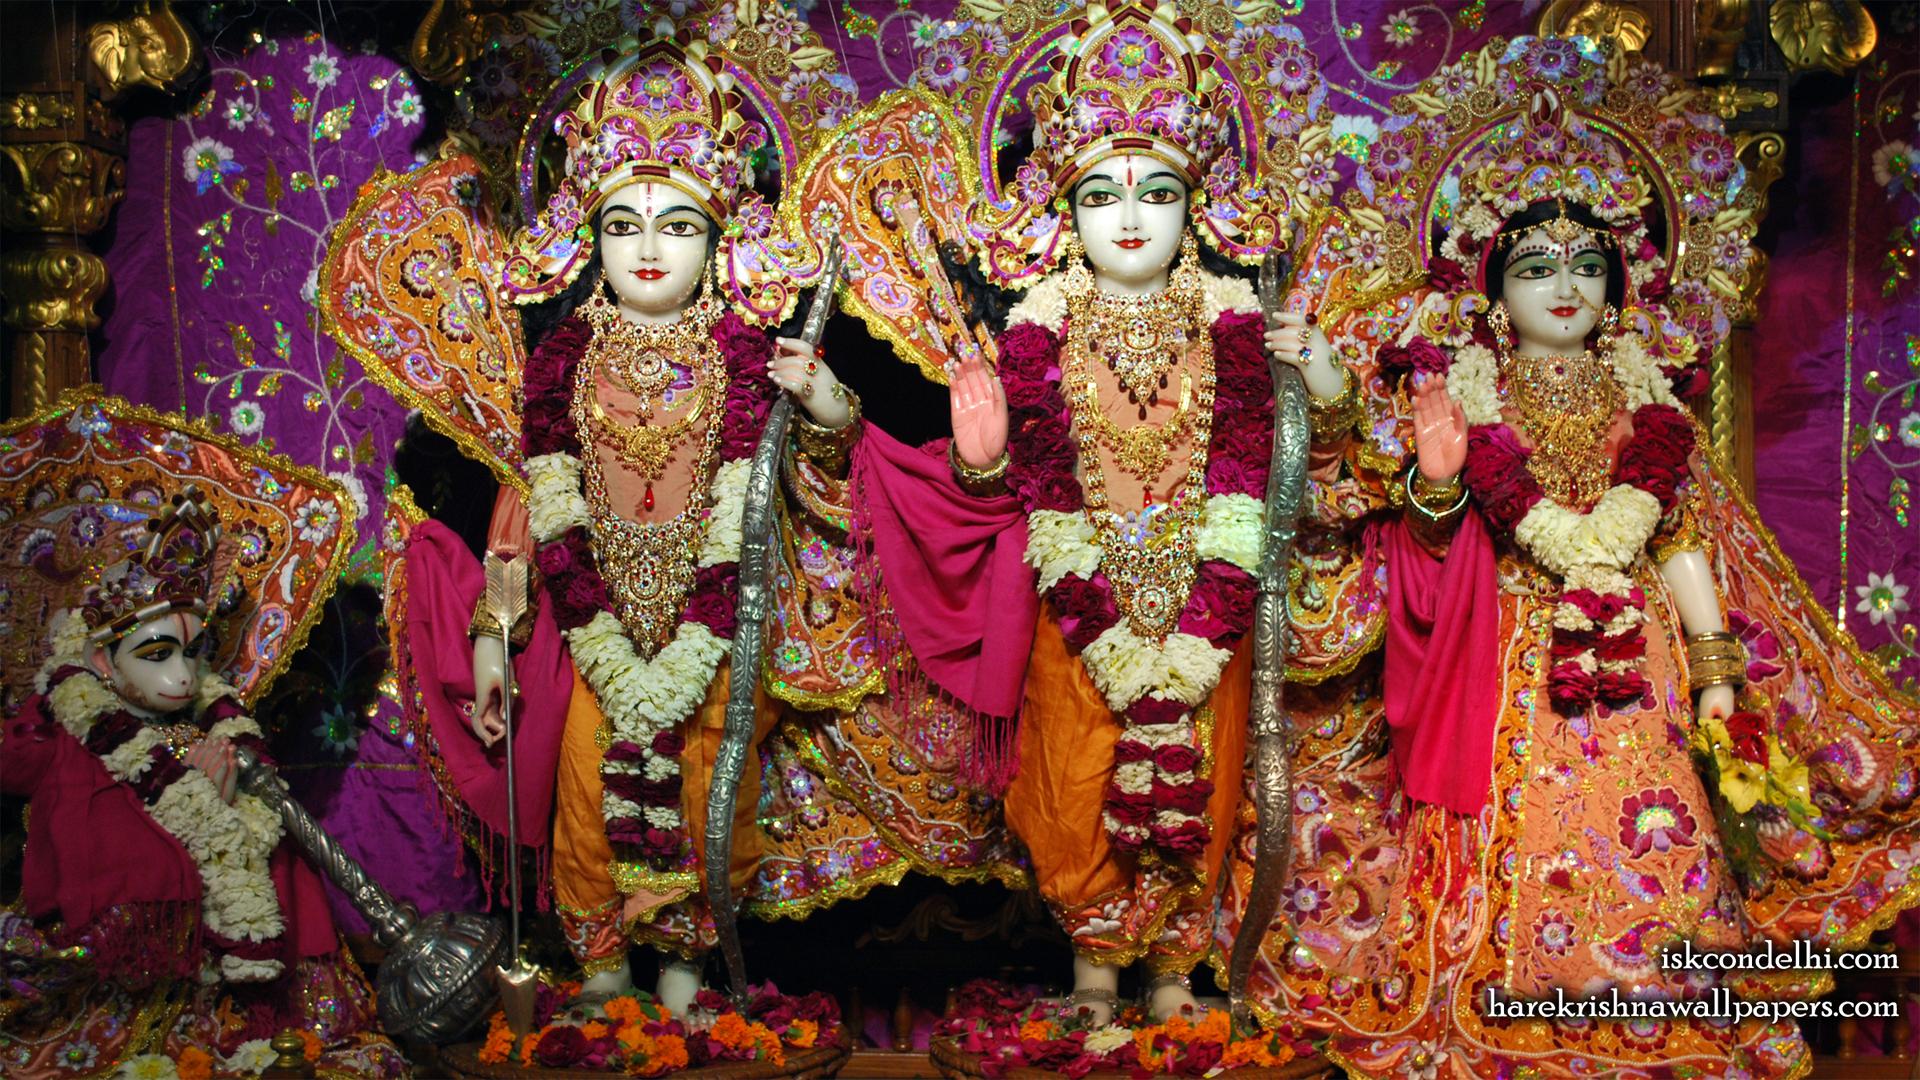 Sri Sri Sita Rama Laxman Hanuman Wallpaper (008) Size 1920x1080 Download